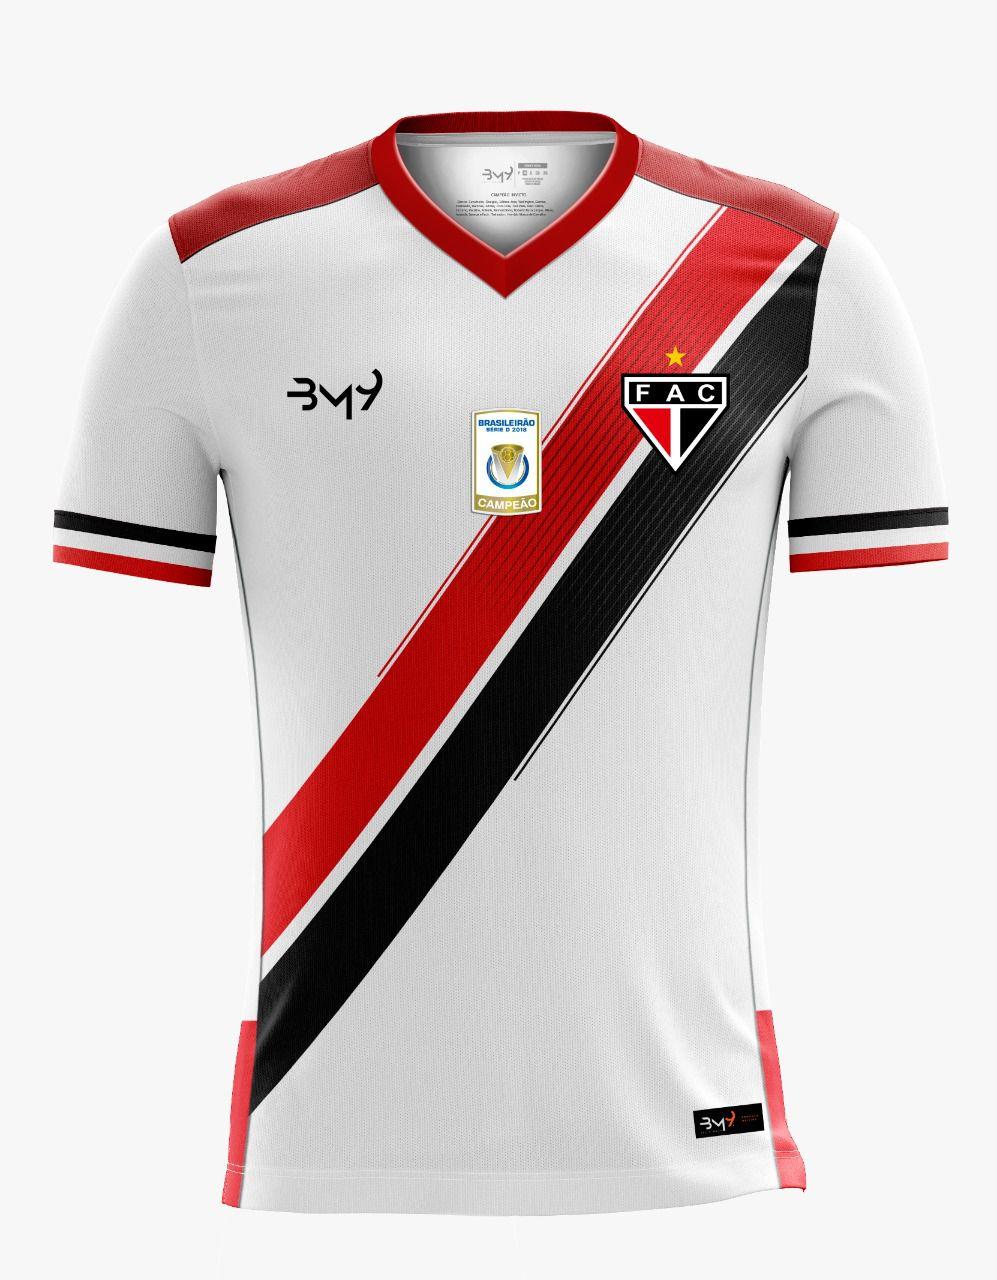 Camisa Uniforme 01 MASCULINA sem  patrocínio REF.1008117 (2019)